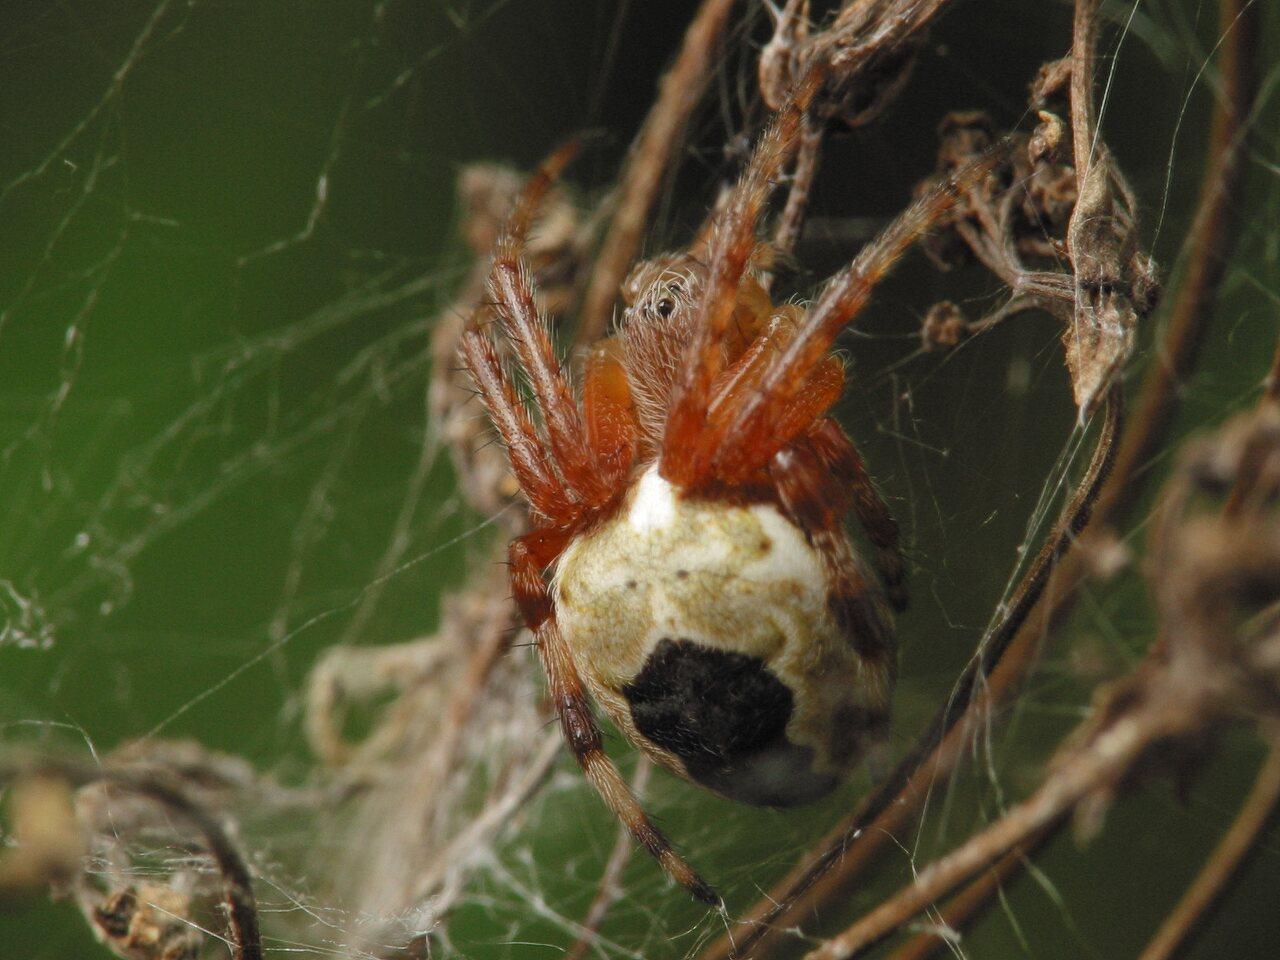 Araneus-marmoreus-4106.jpg